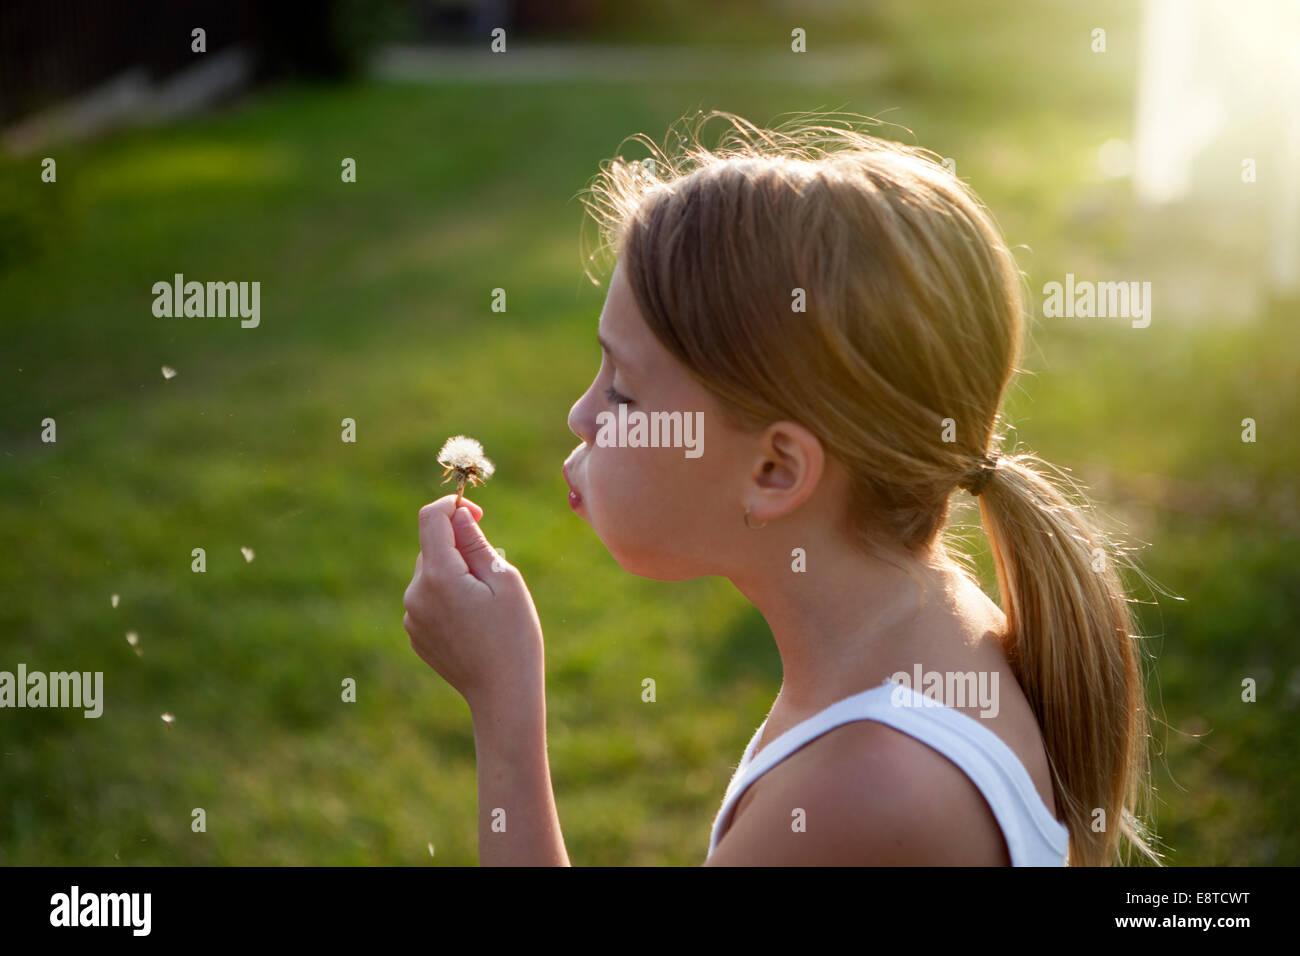 Caucasian girl blowing seeds off dandelion Stock Photo